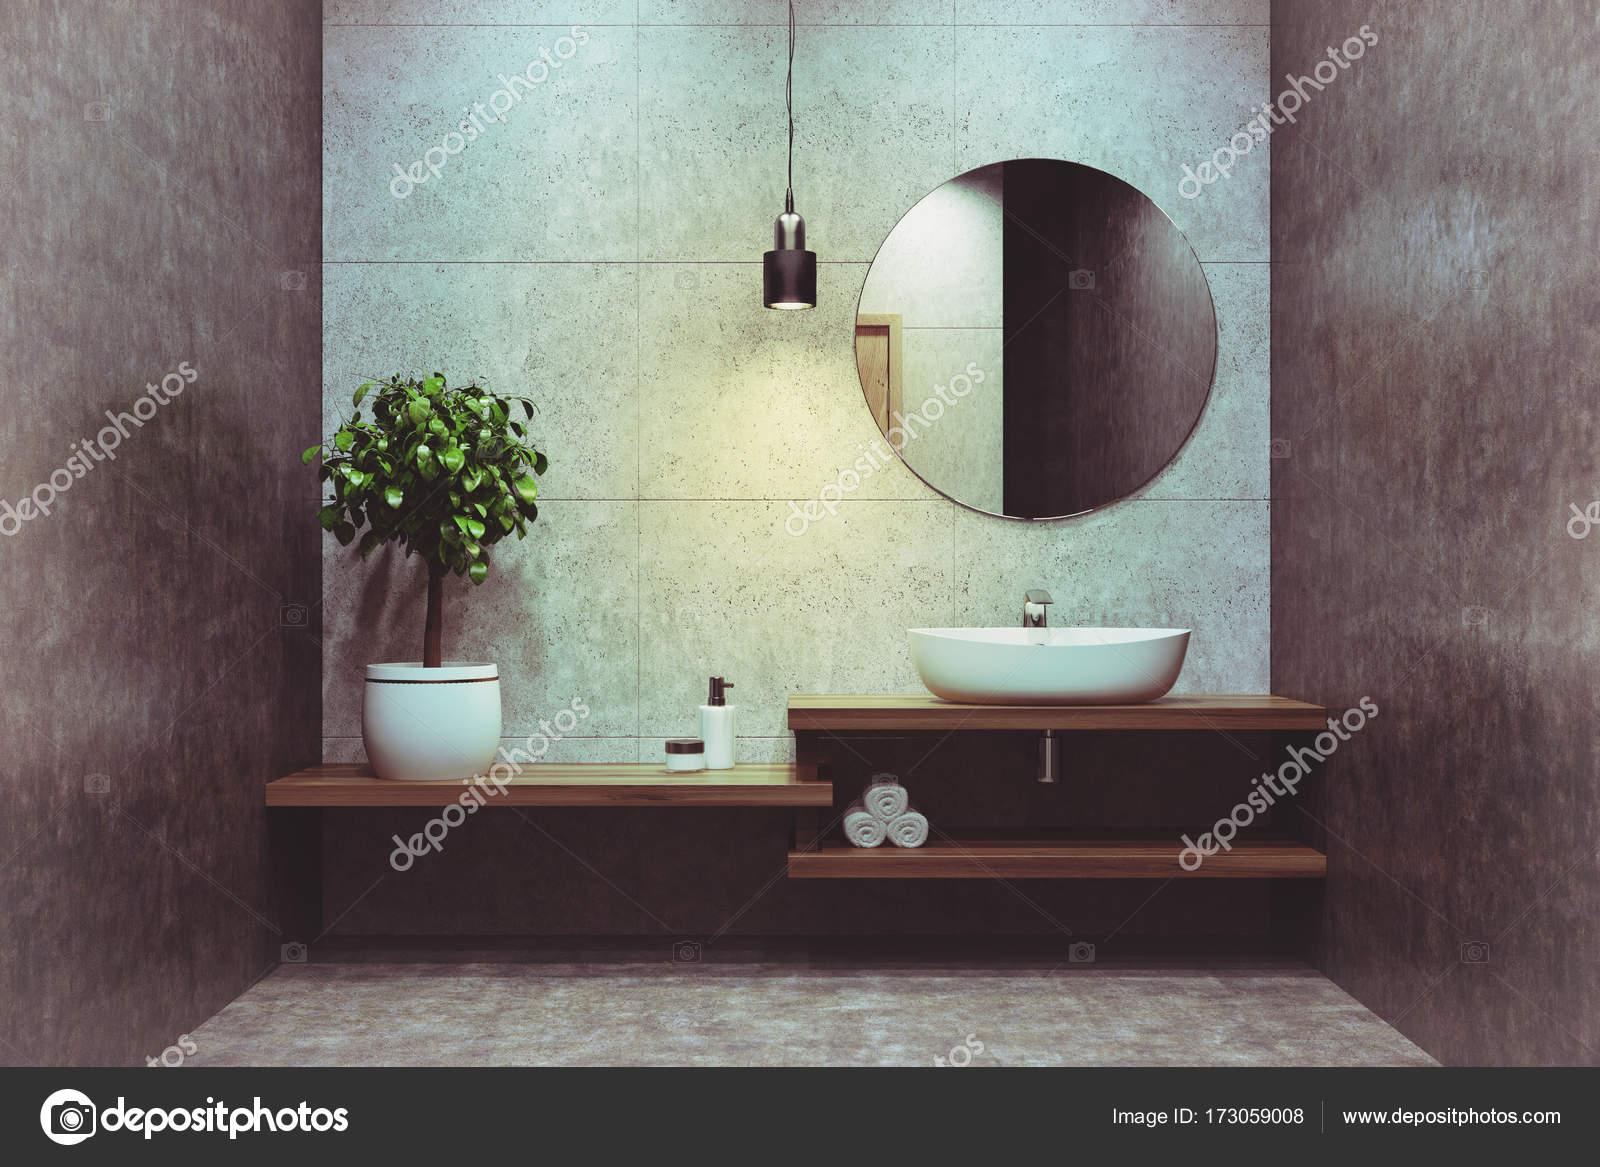 Hoek Wasbak Badkamer : Wastafel op plank perfect badkamer wastafel plank stijlvol een